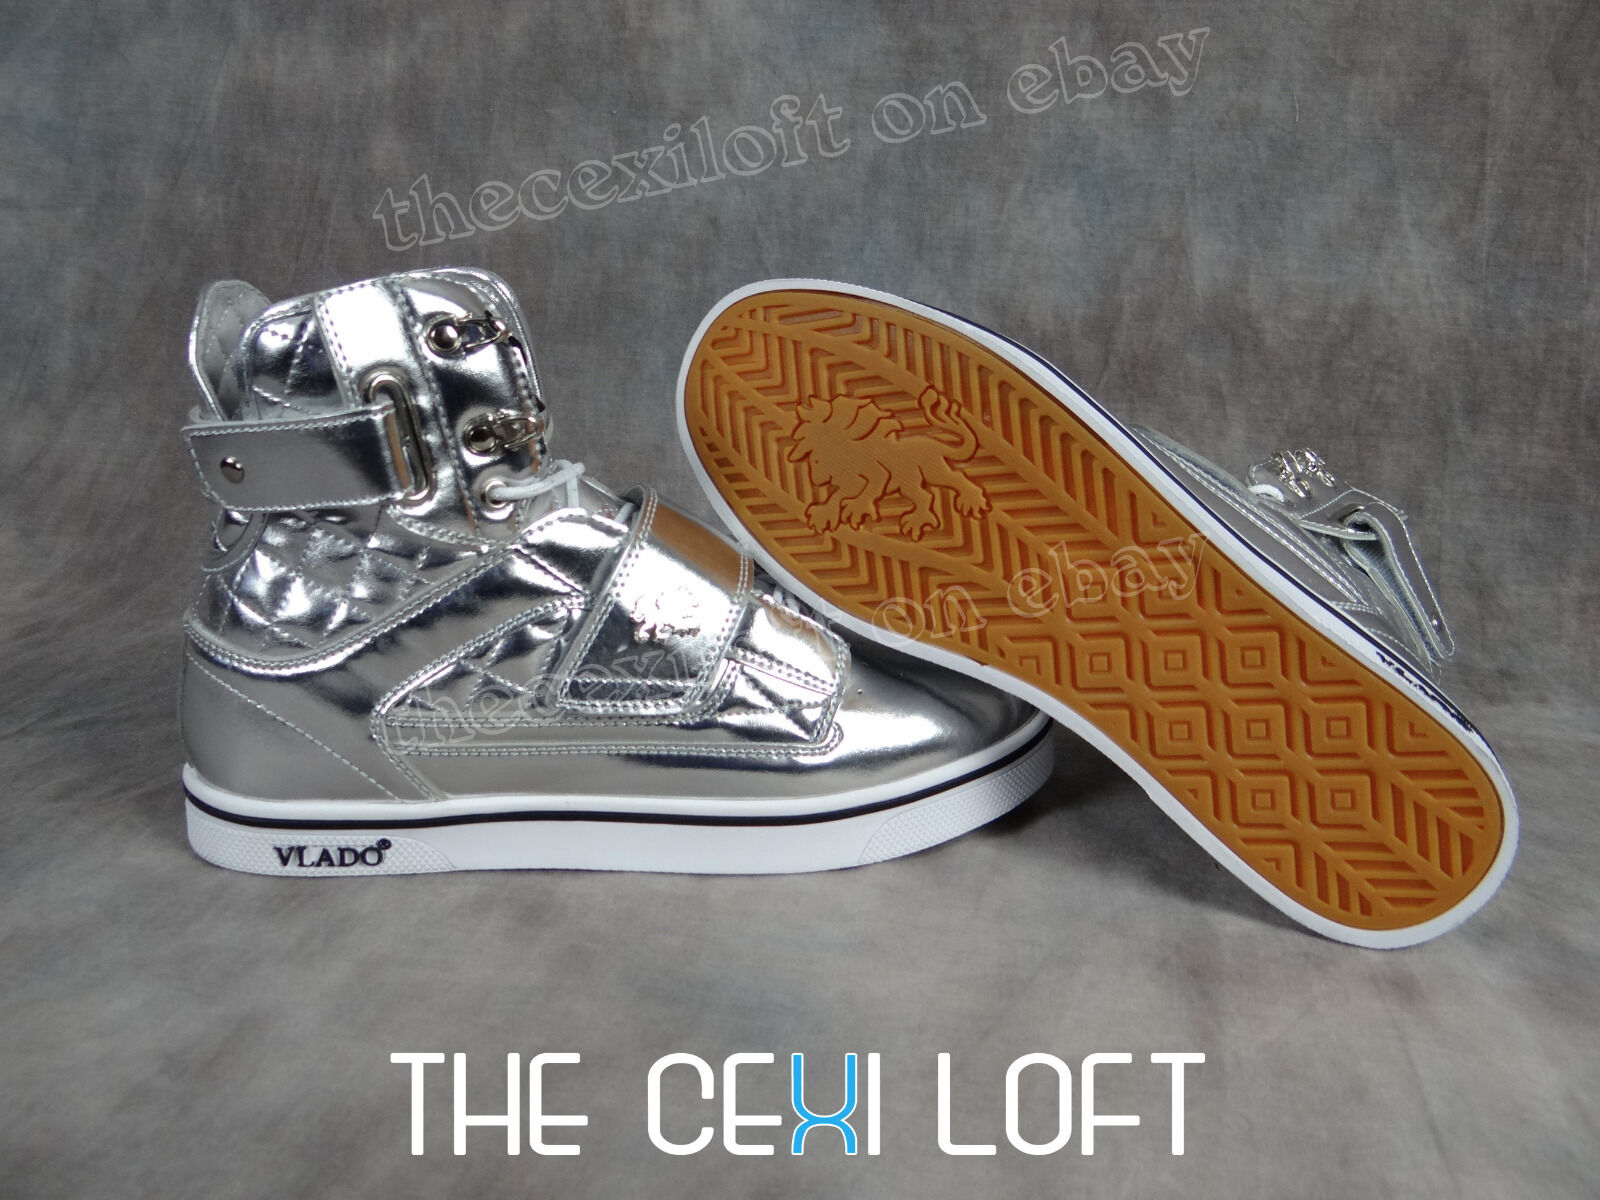 NEW Mens VLADO High Top Shoes ATLAS Shiny METALIC CHROME White Sole *FRESH*